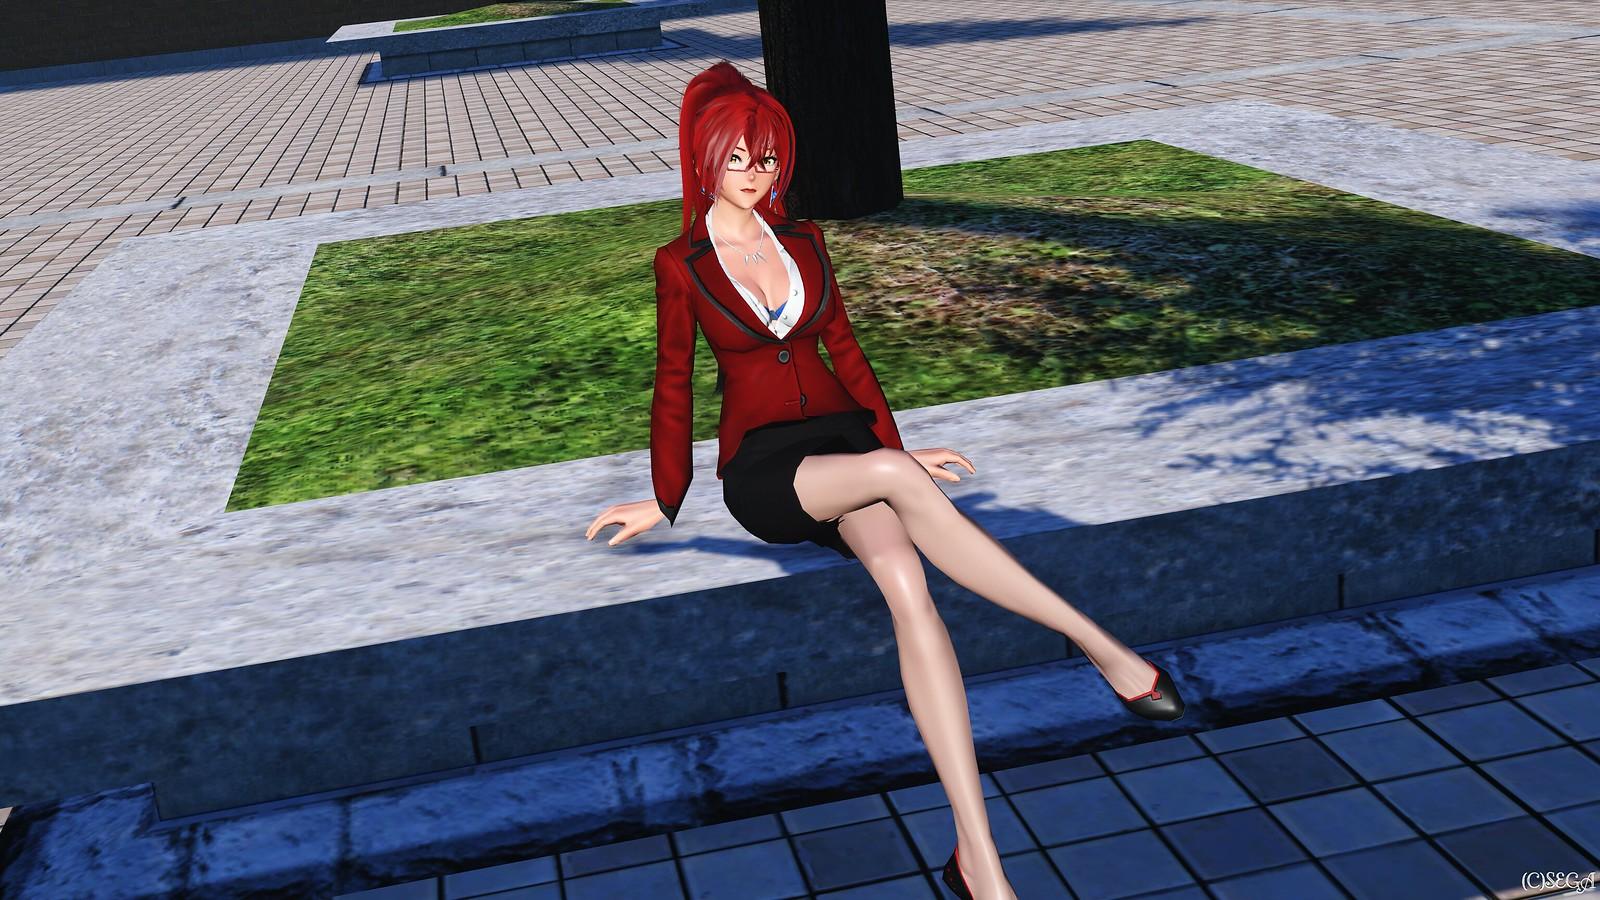 Phantasy Star Online 2 Screenshot 2021.04.04 - 17.40.40.15